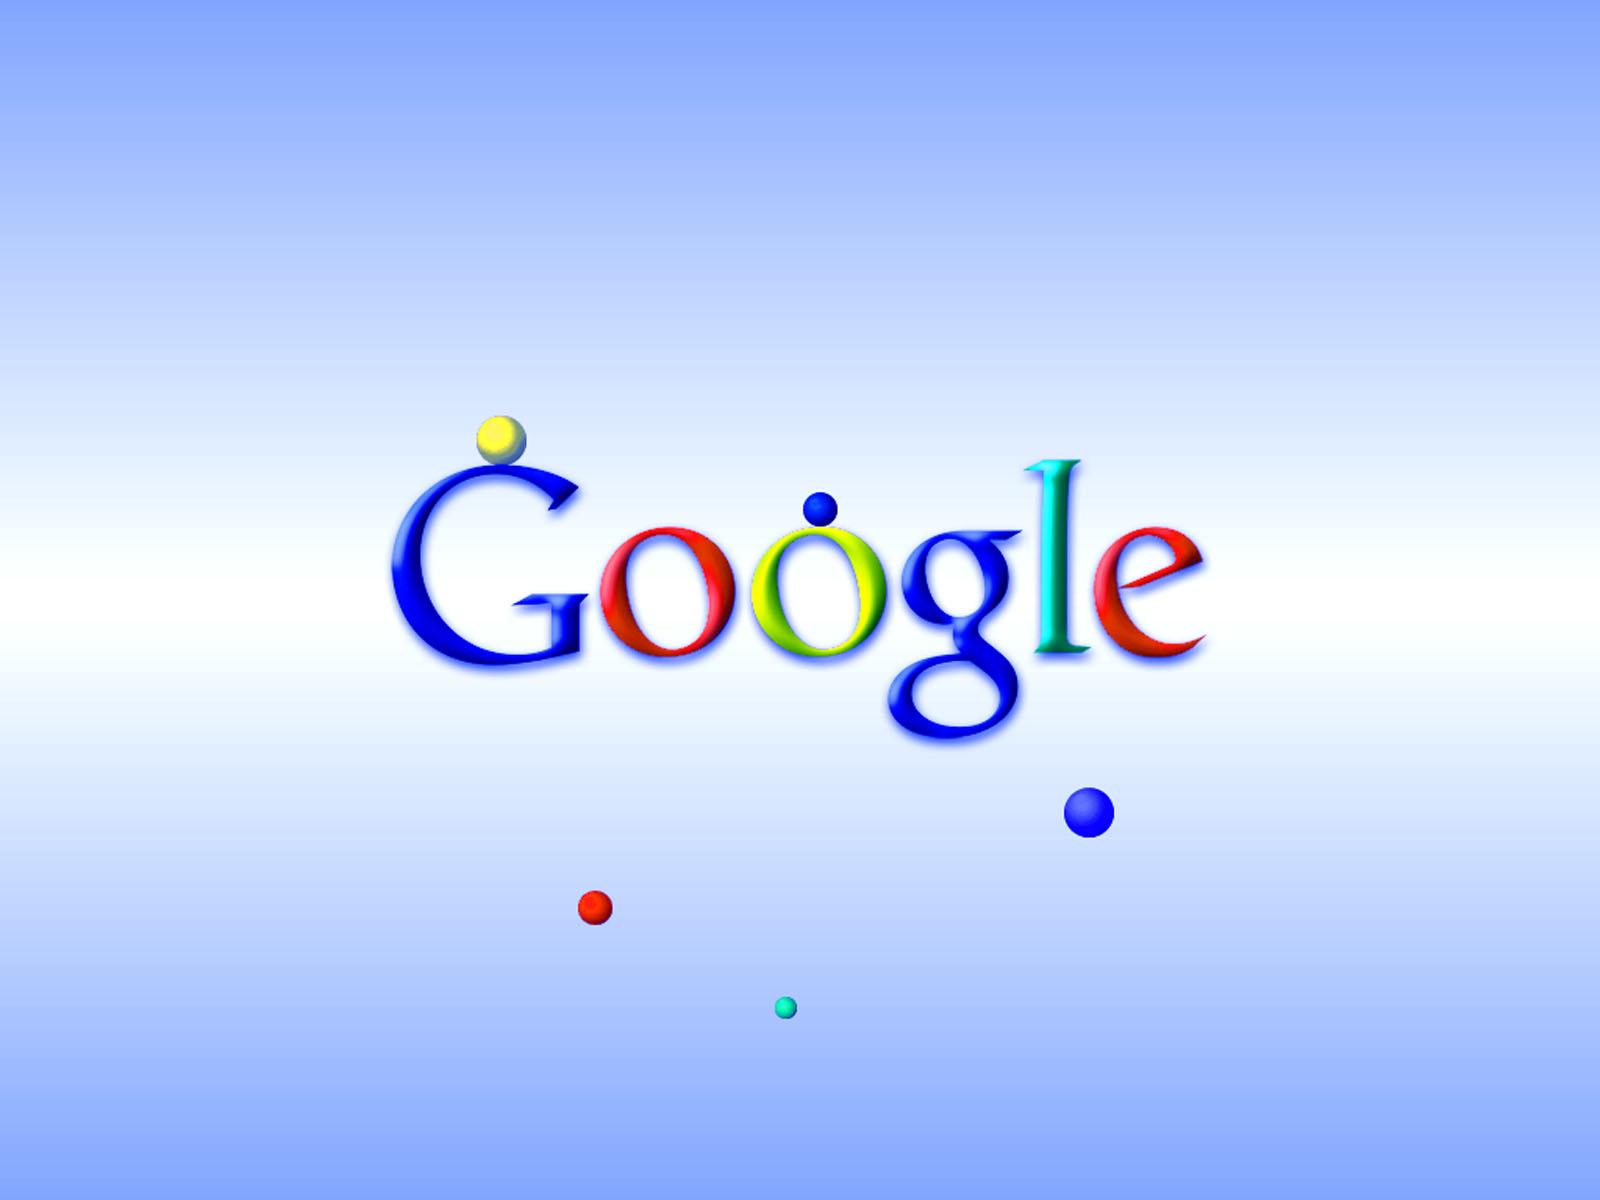 64 Google Free Wallpaper Backgrounds On Wallpapersafari